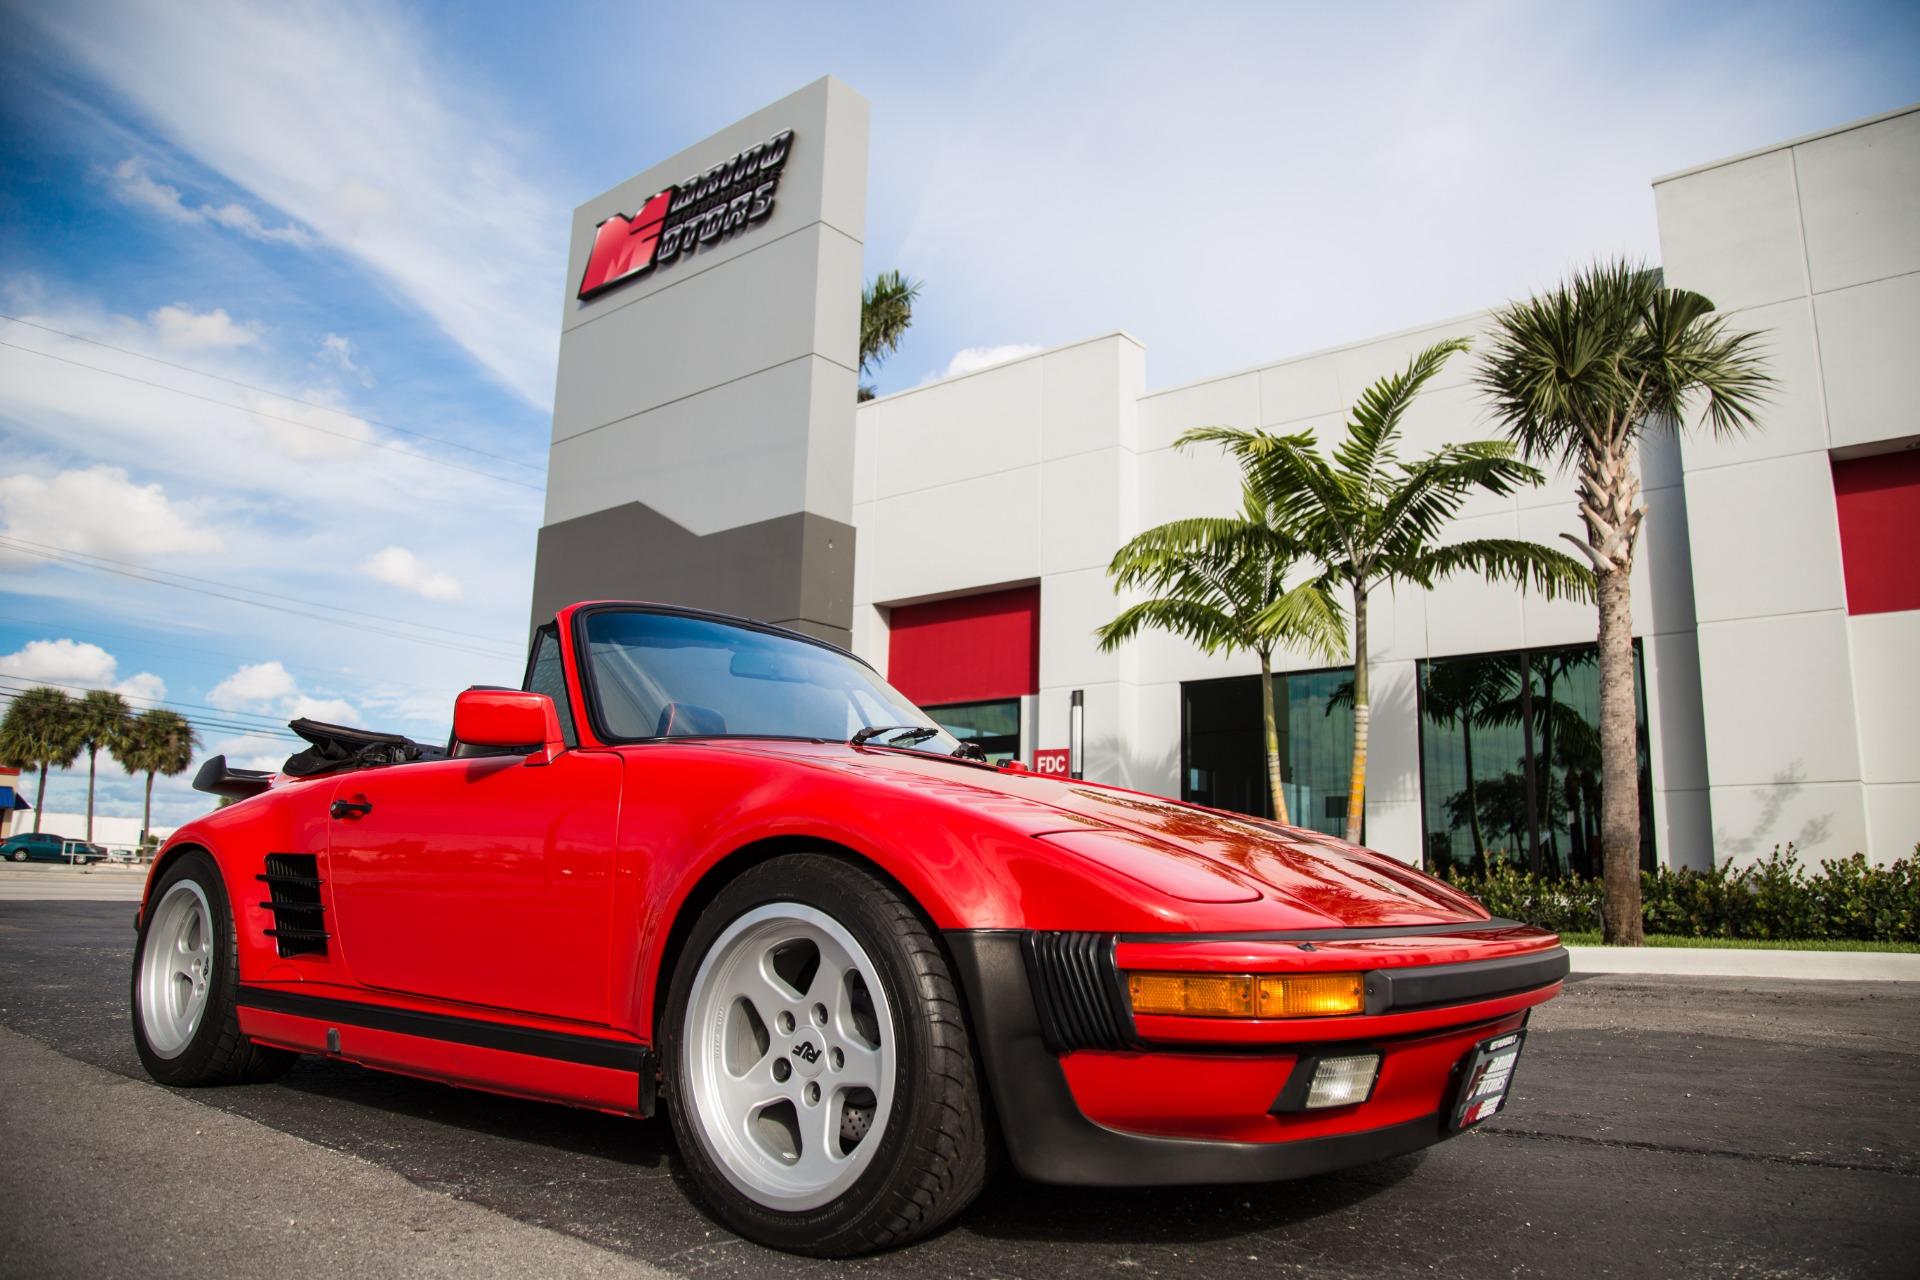 Used-1988-Porsche-911-Turbo-Cabriolet